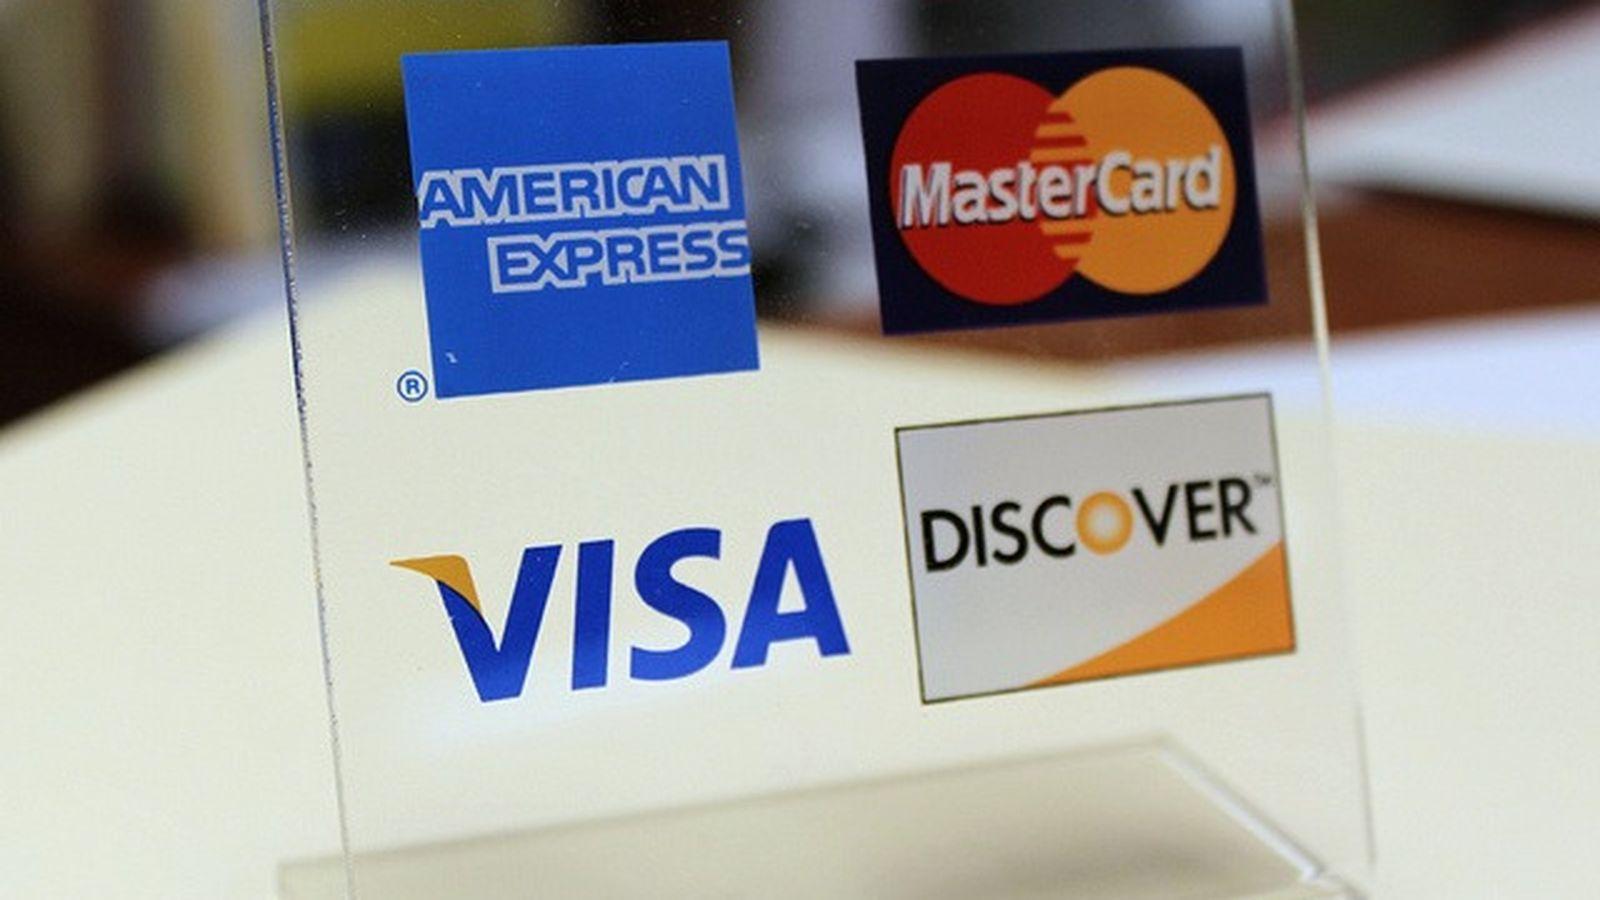 OK Merchant Payment Solutions